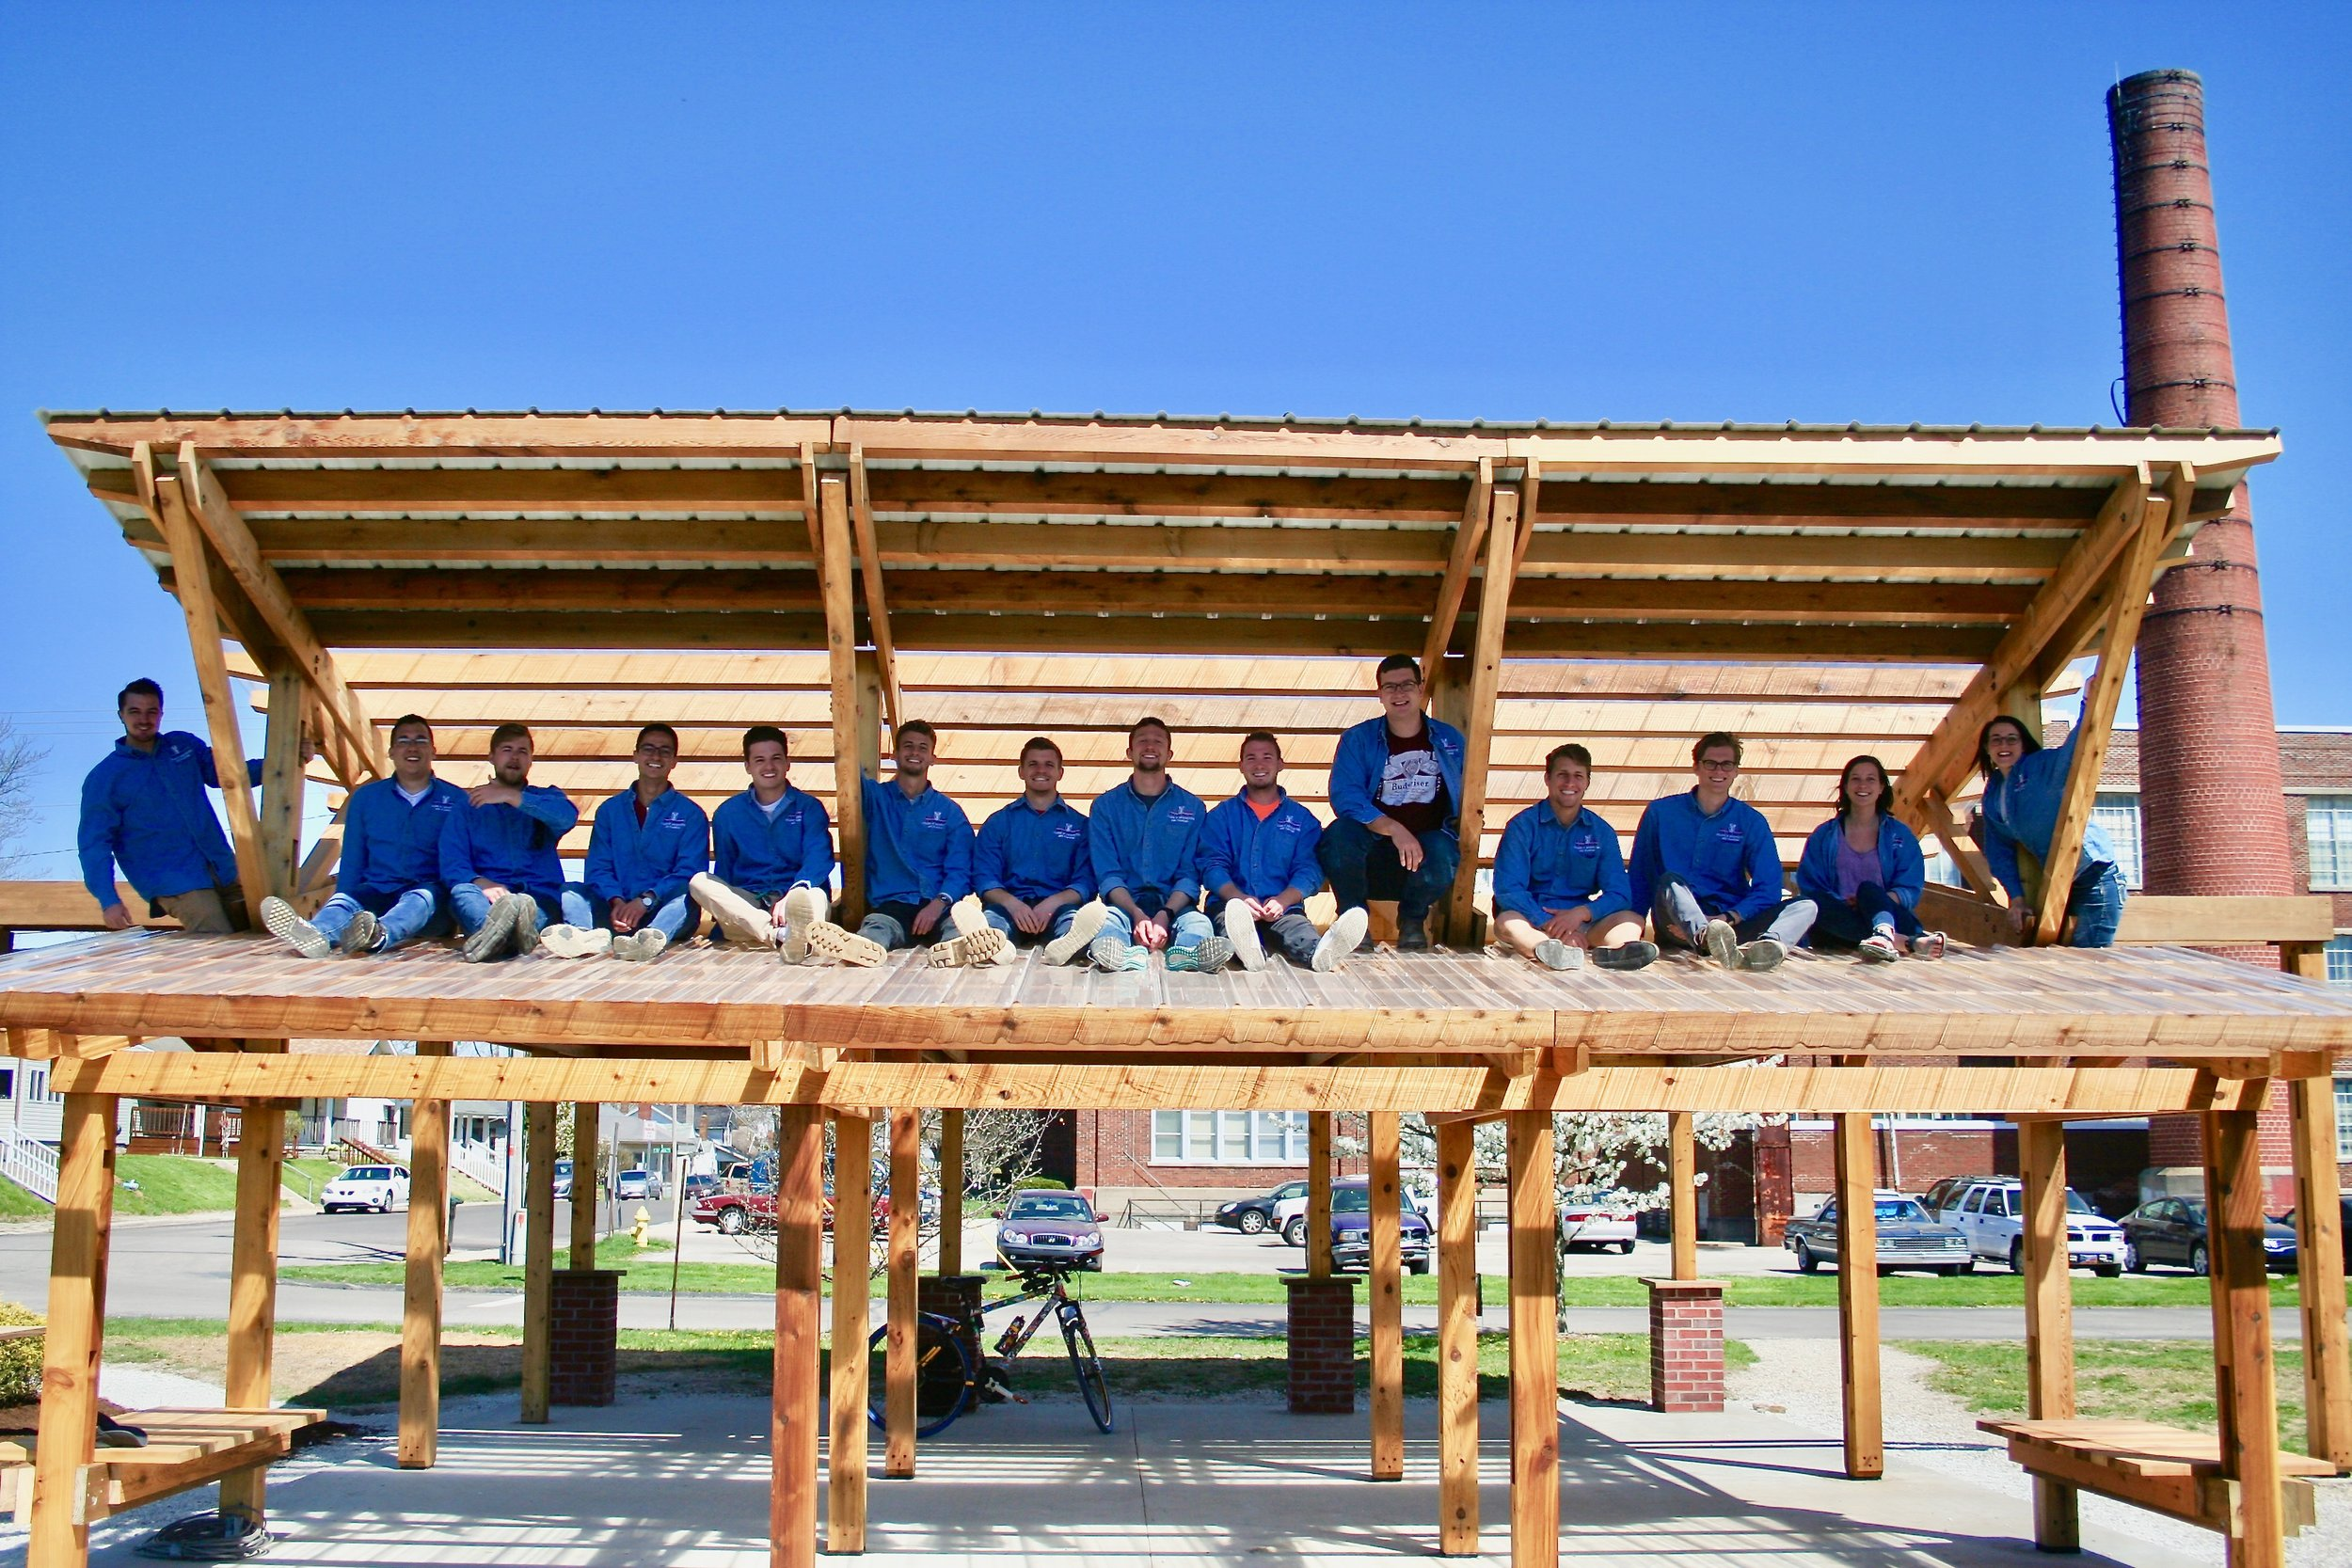 Spring 2018 Maring Hunt Community Garden Pavilion Team